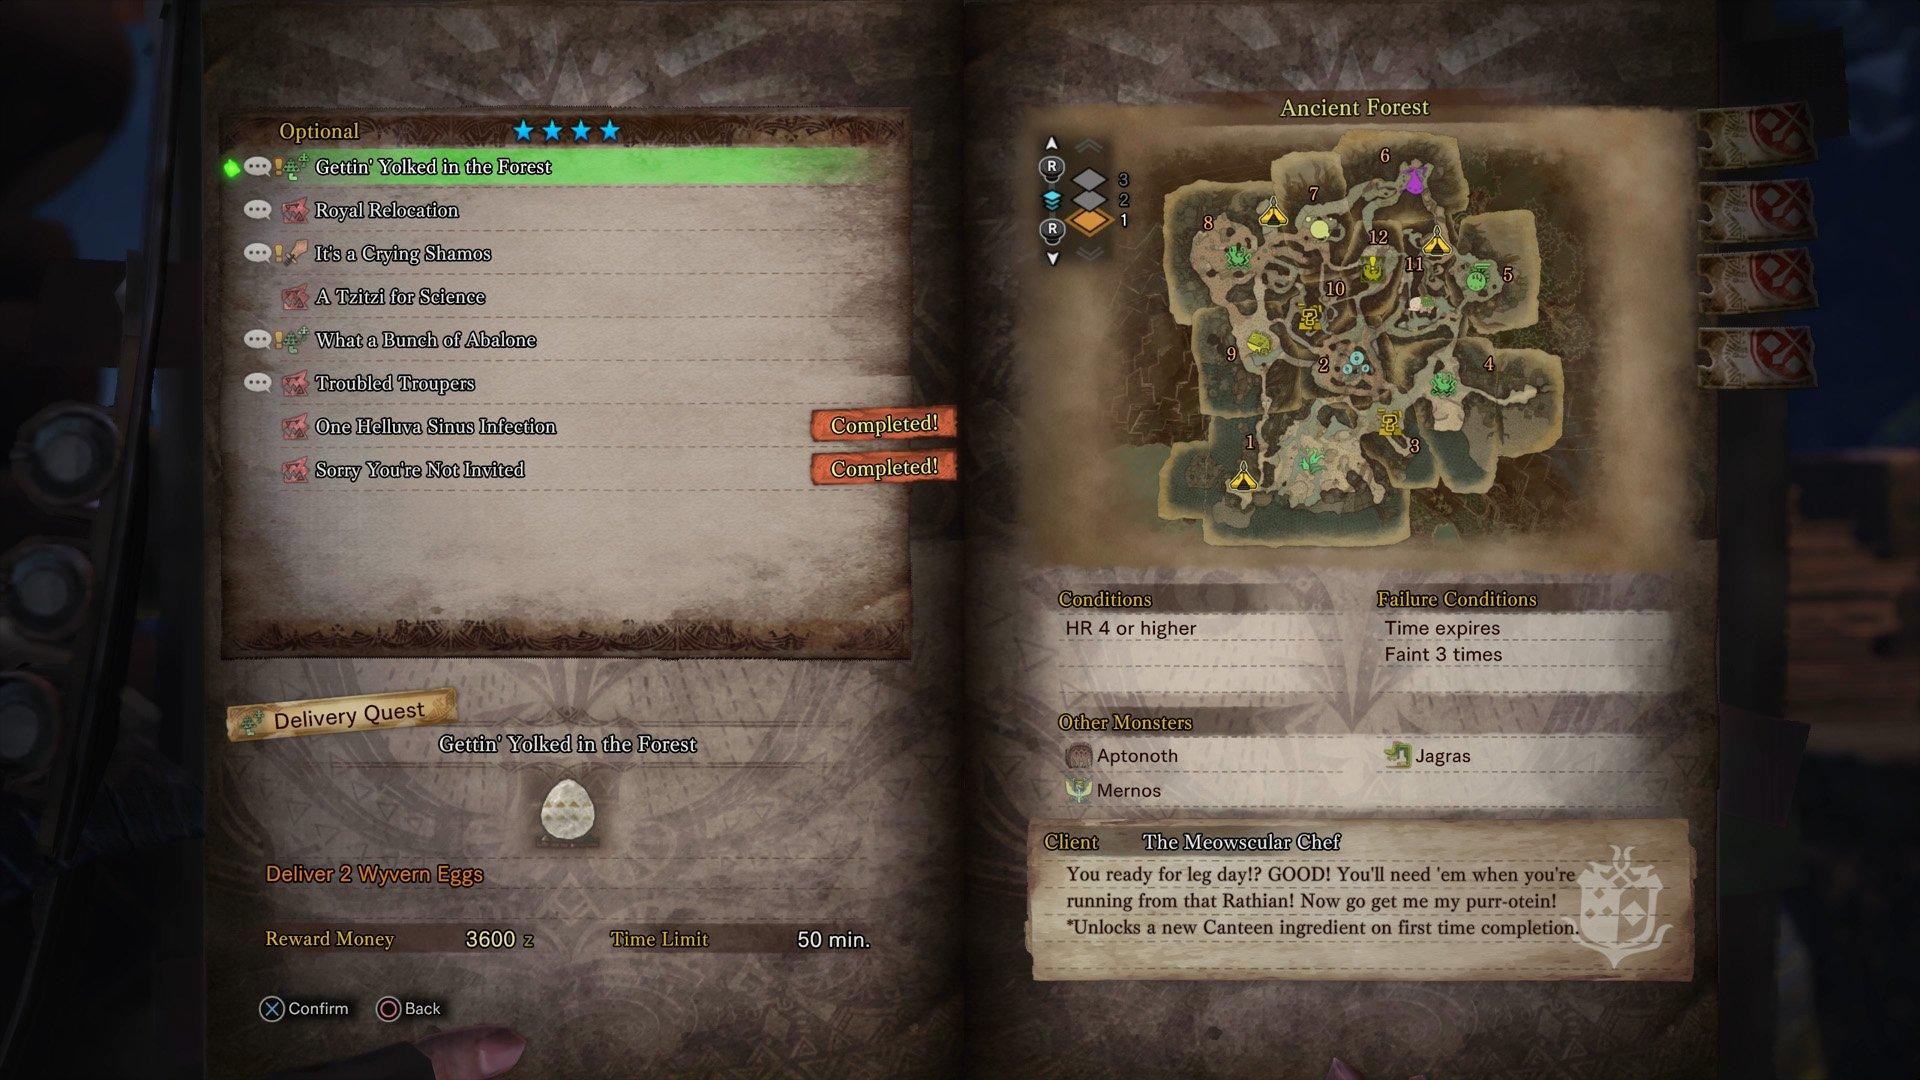 Monster Hunter World - Gettin' Yolked in the Forest